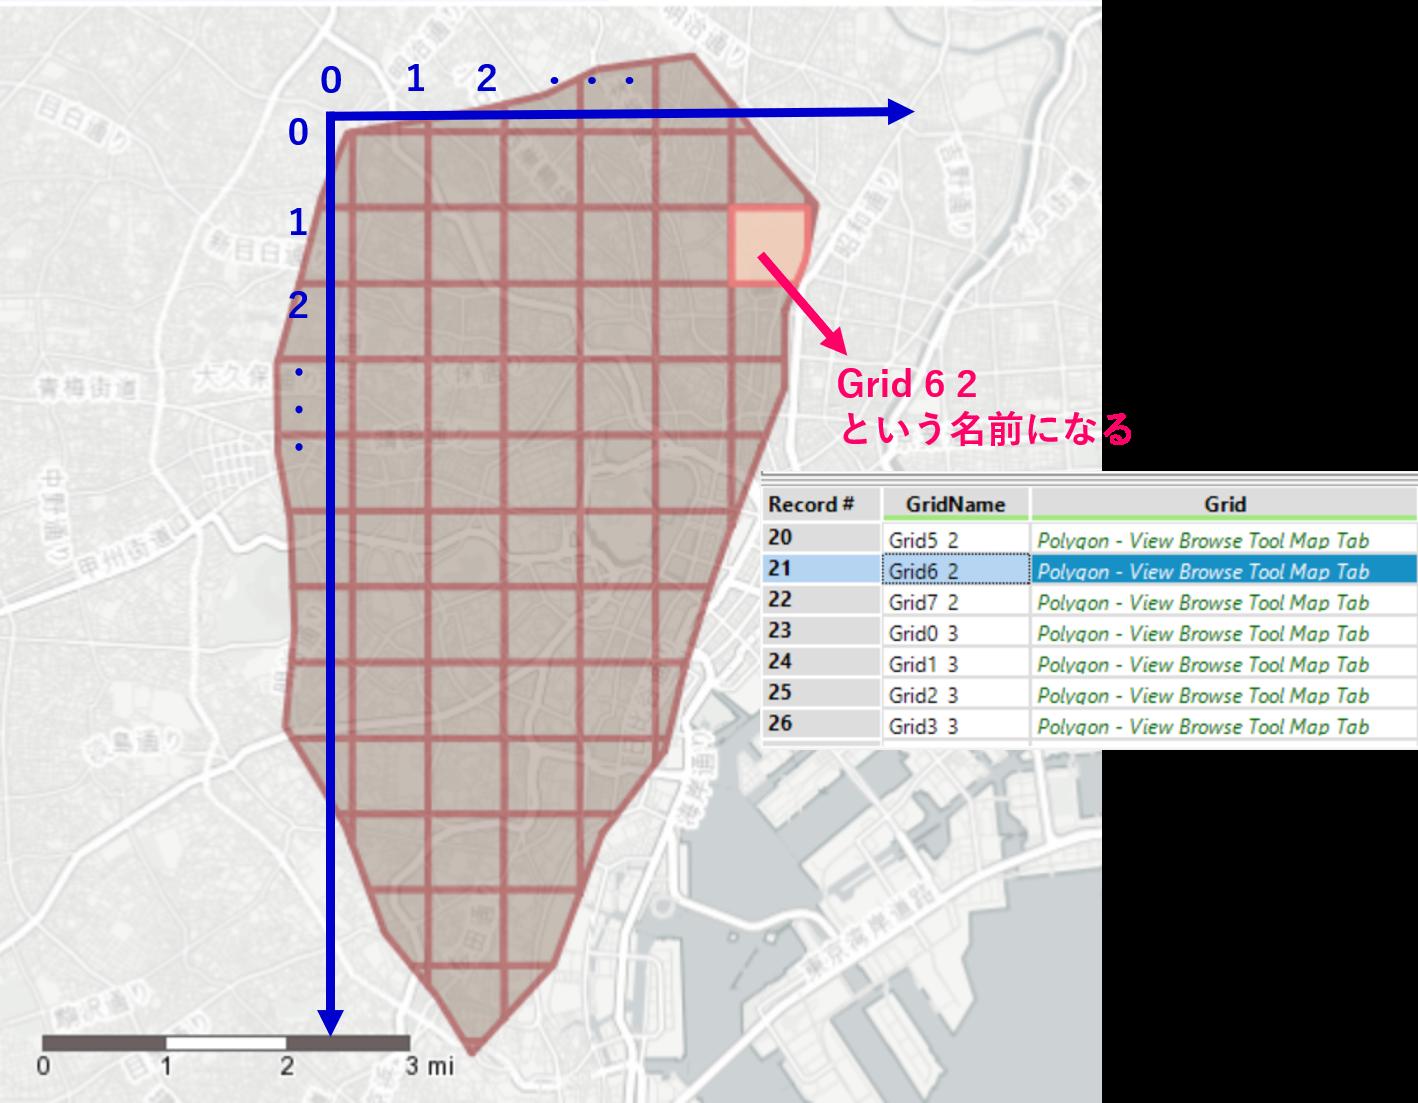 Alteryx Spatial Make Grid Tool 名称説明図